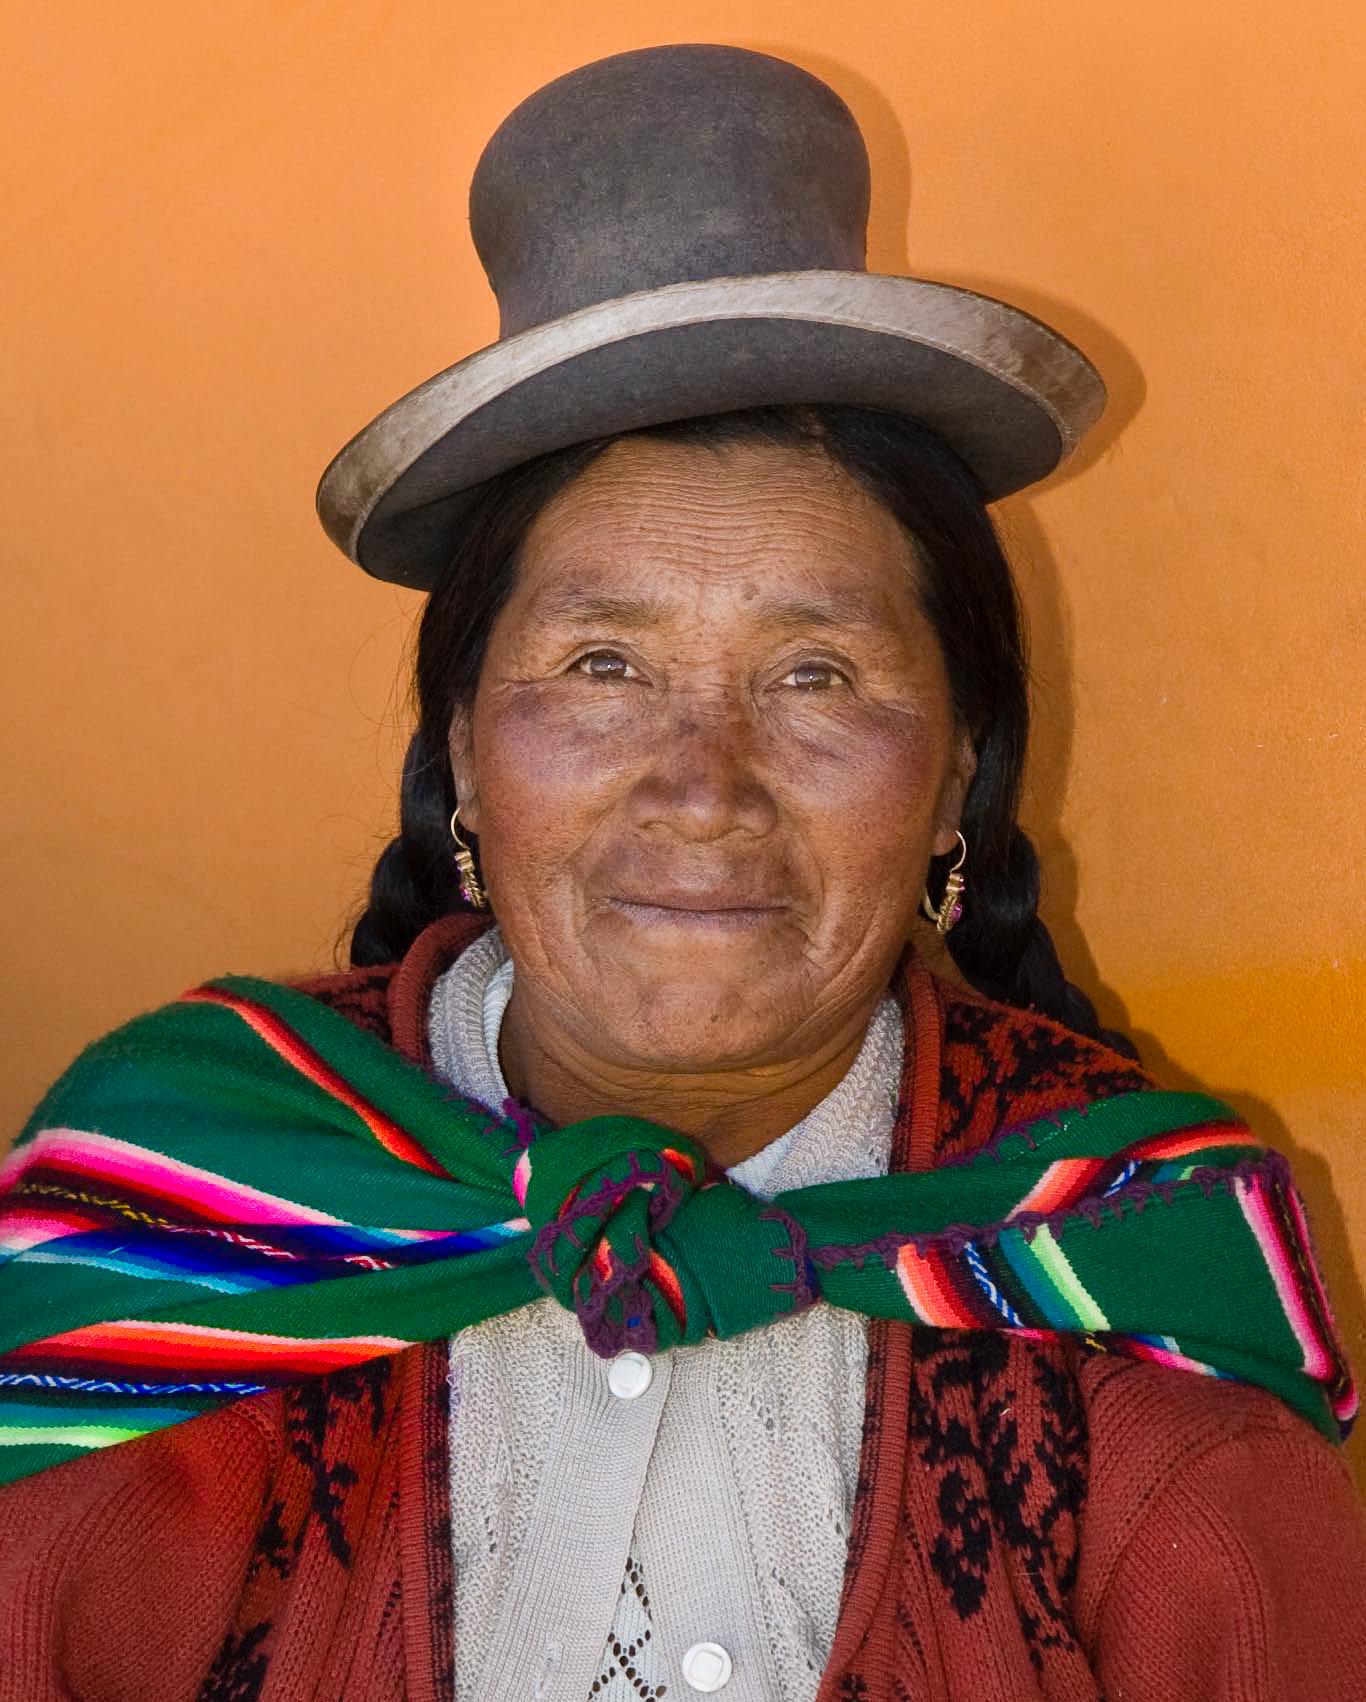 Peru - The Mission Society